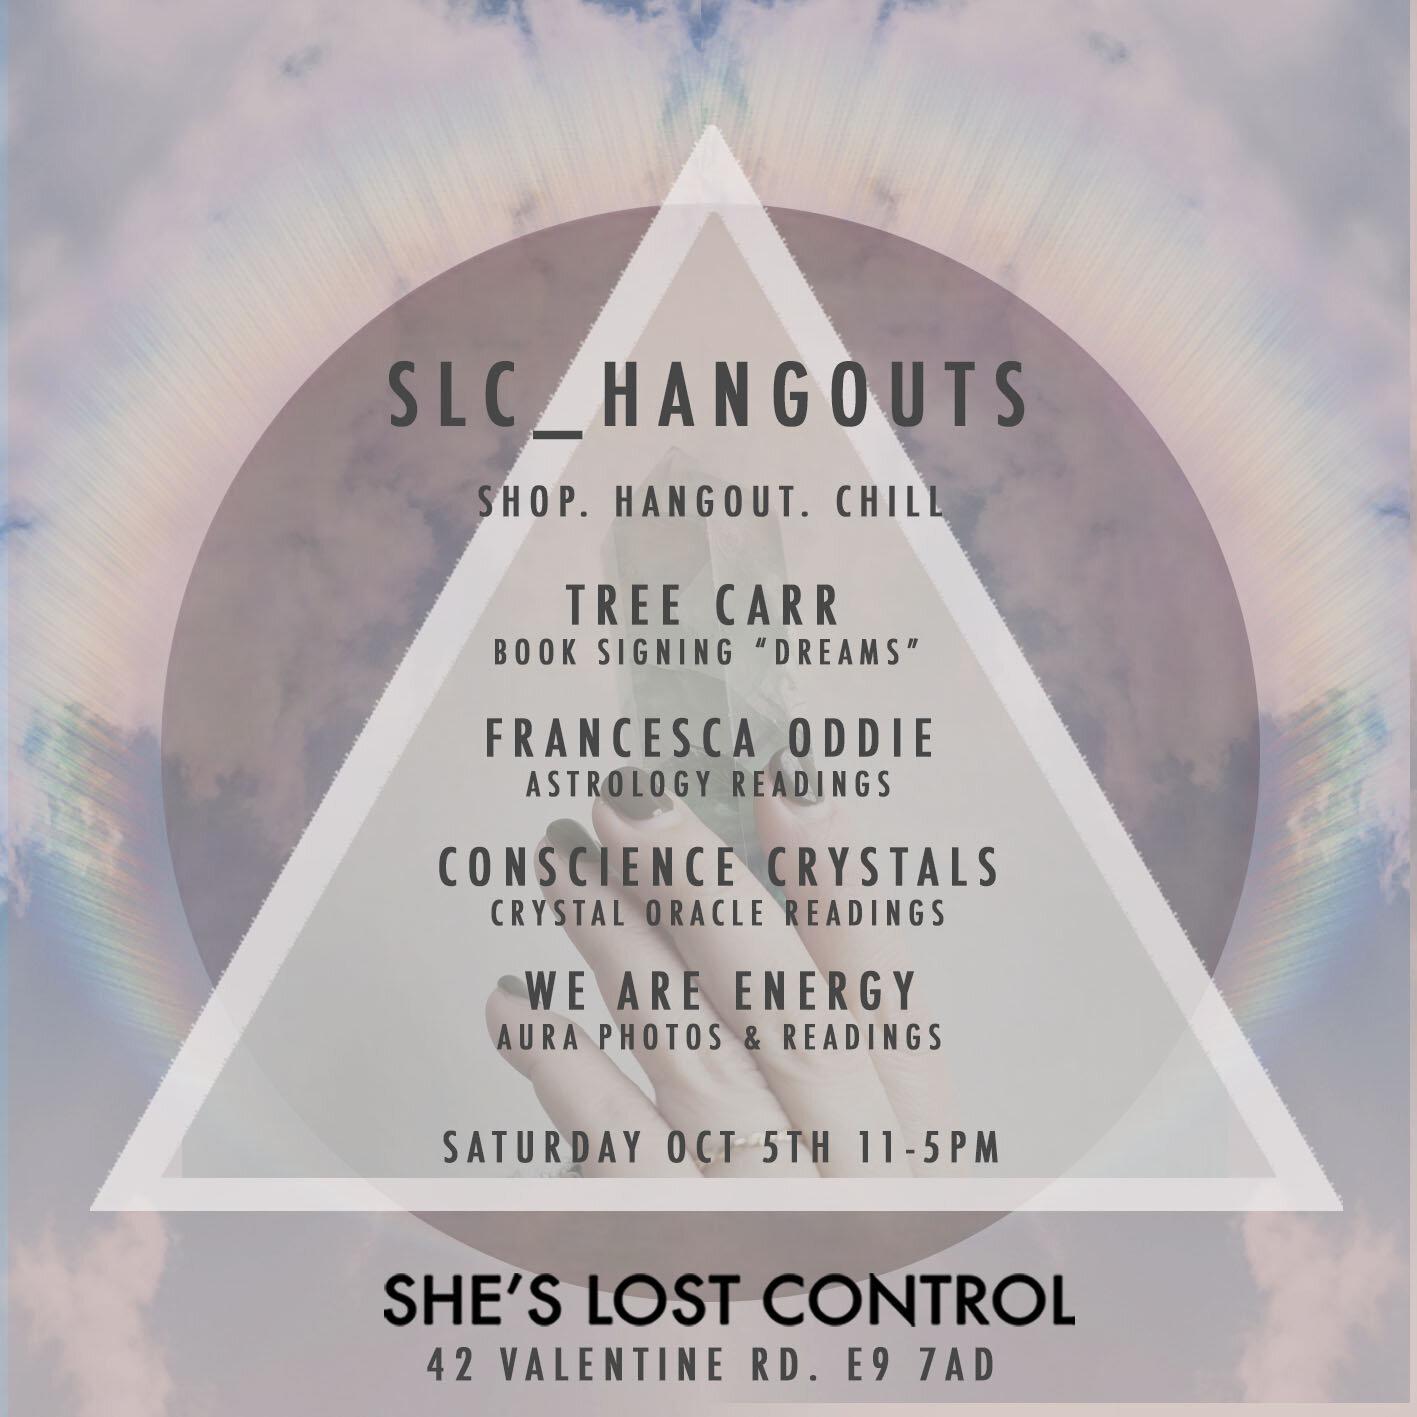 SLC HANGOUTS Oct 5th.jpg